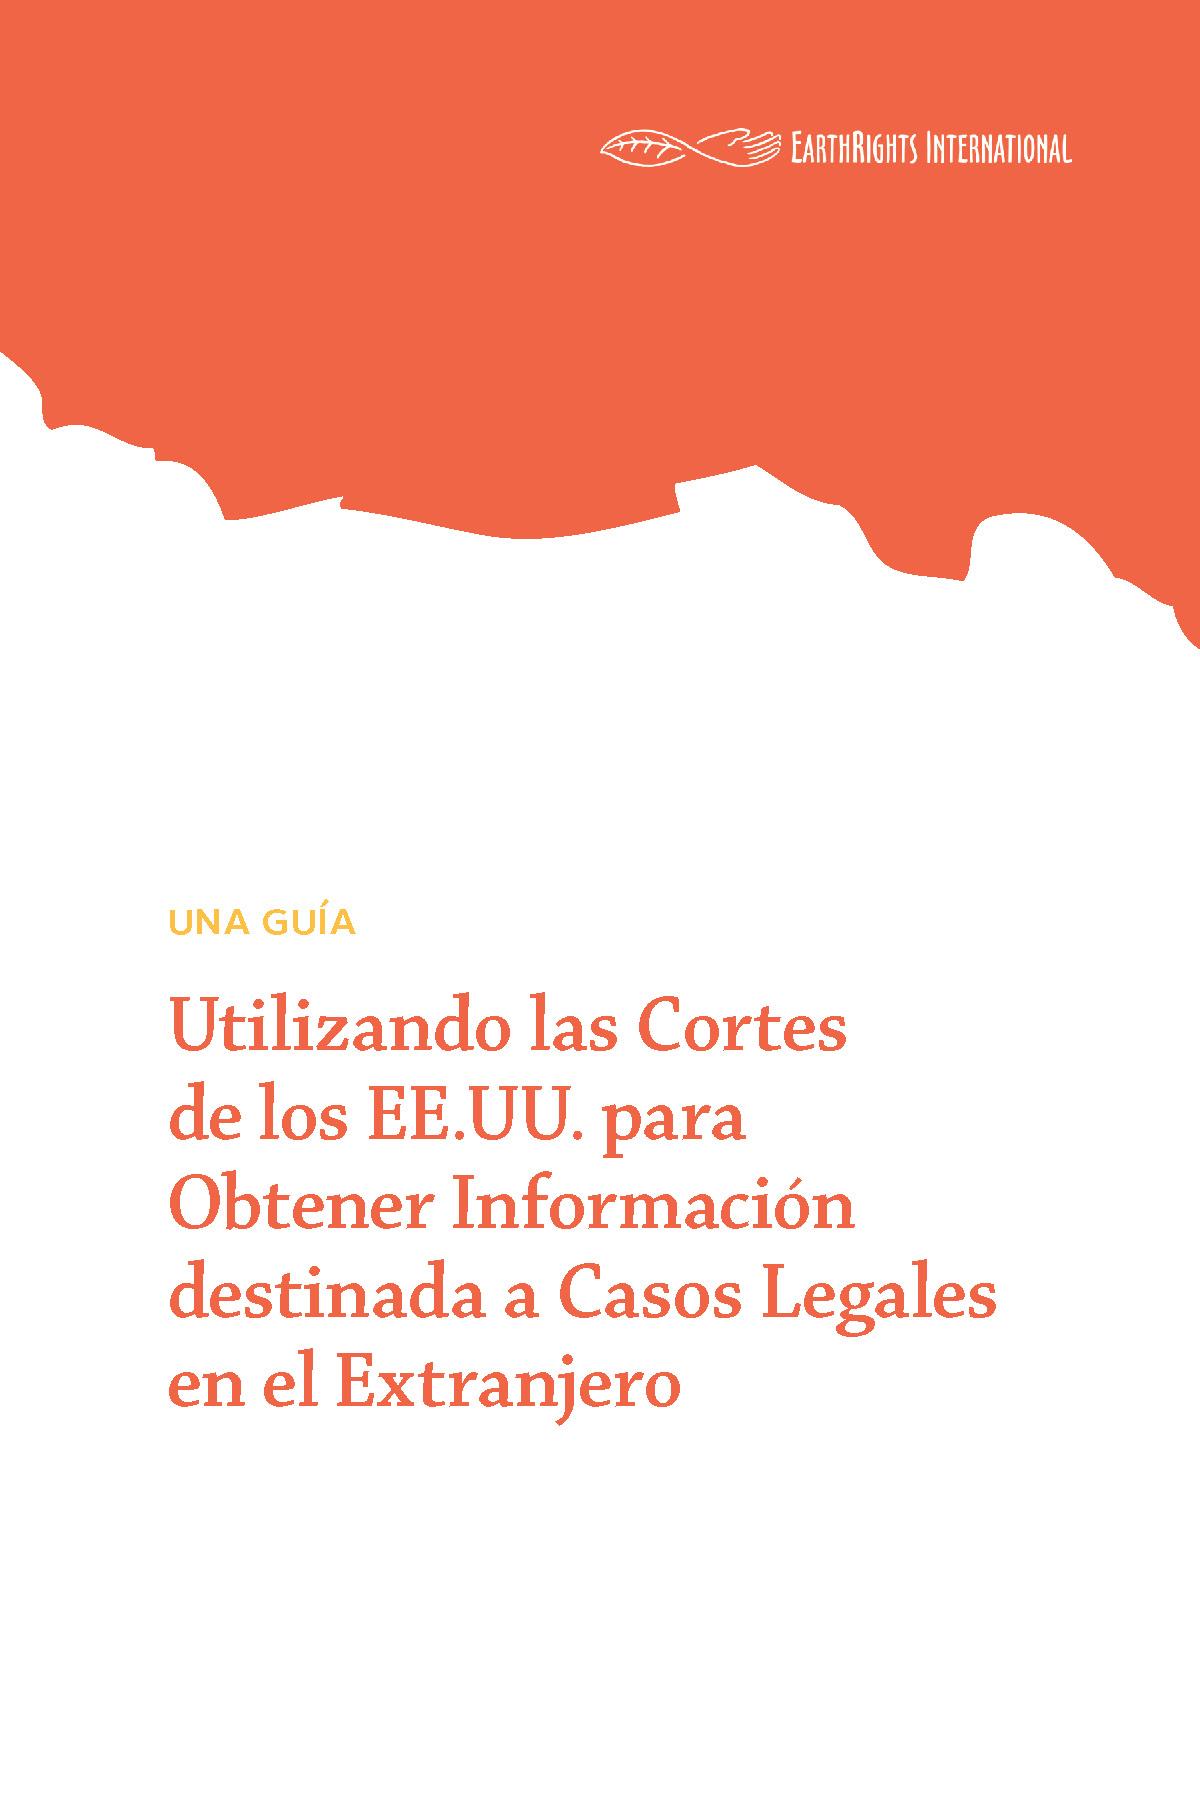 fla_spanish_cover.jpg